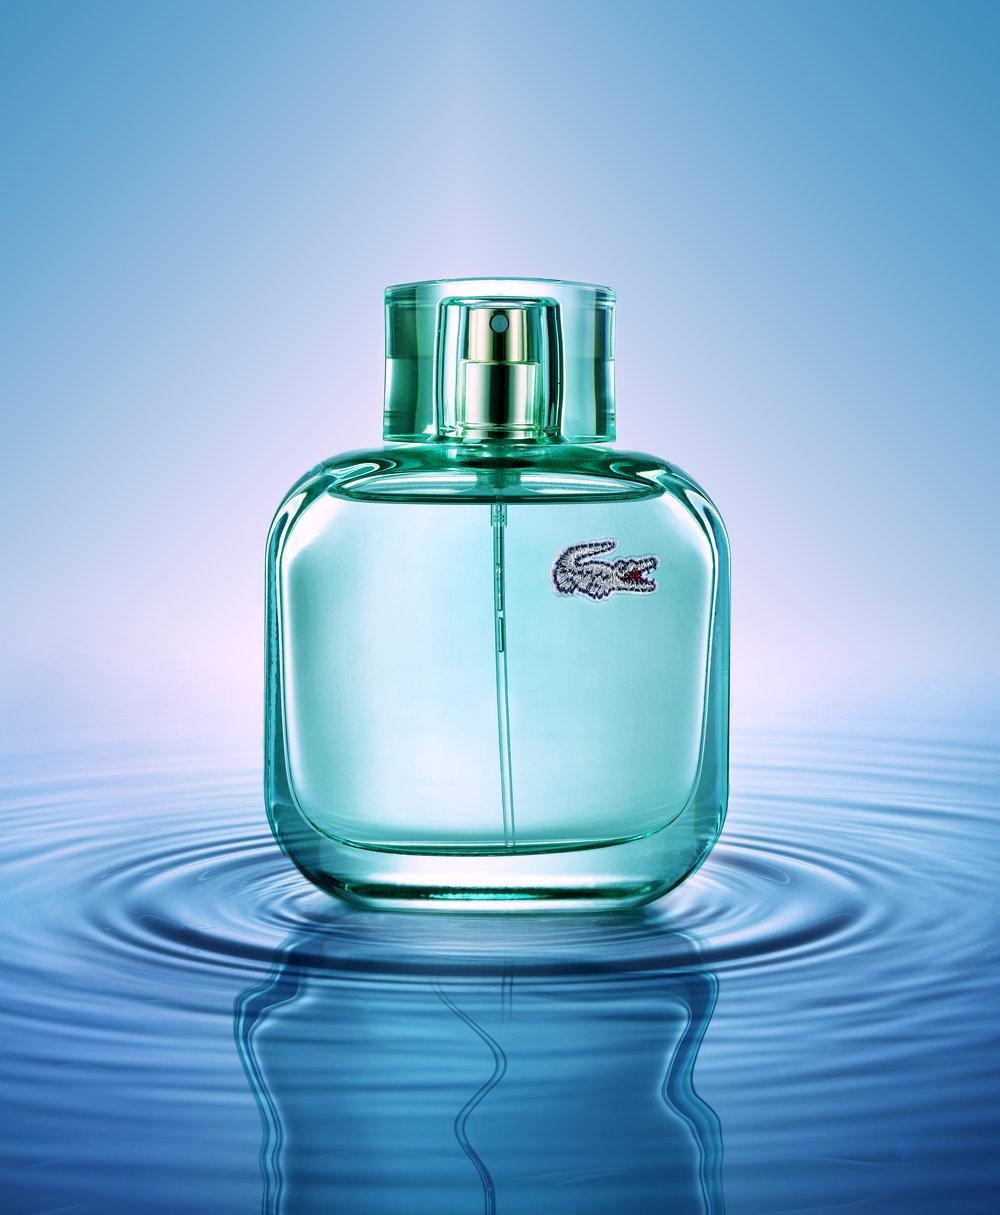 Lacoste Perfume 49_ripple.jpg